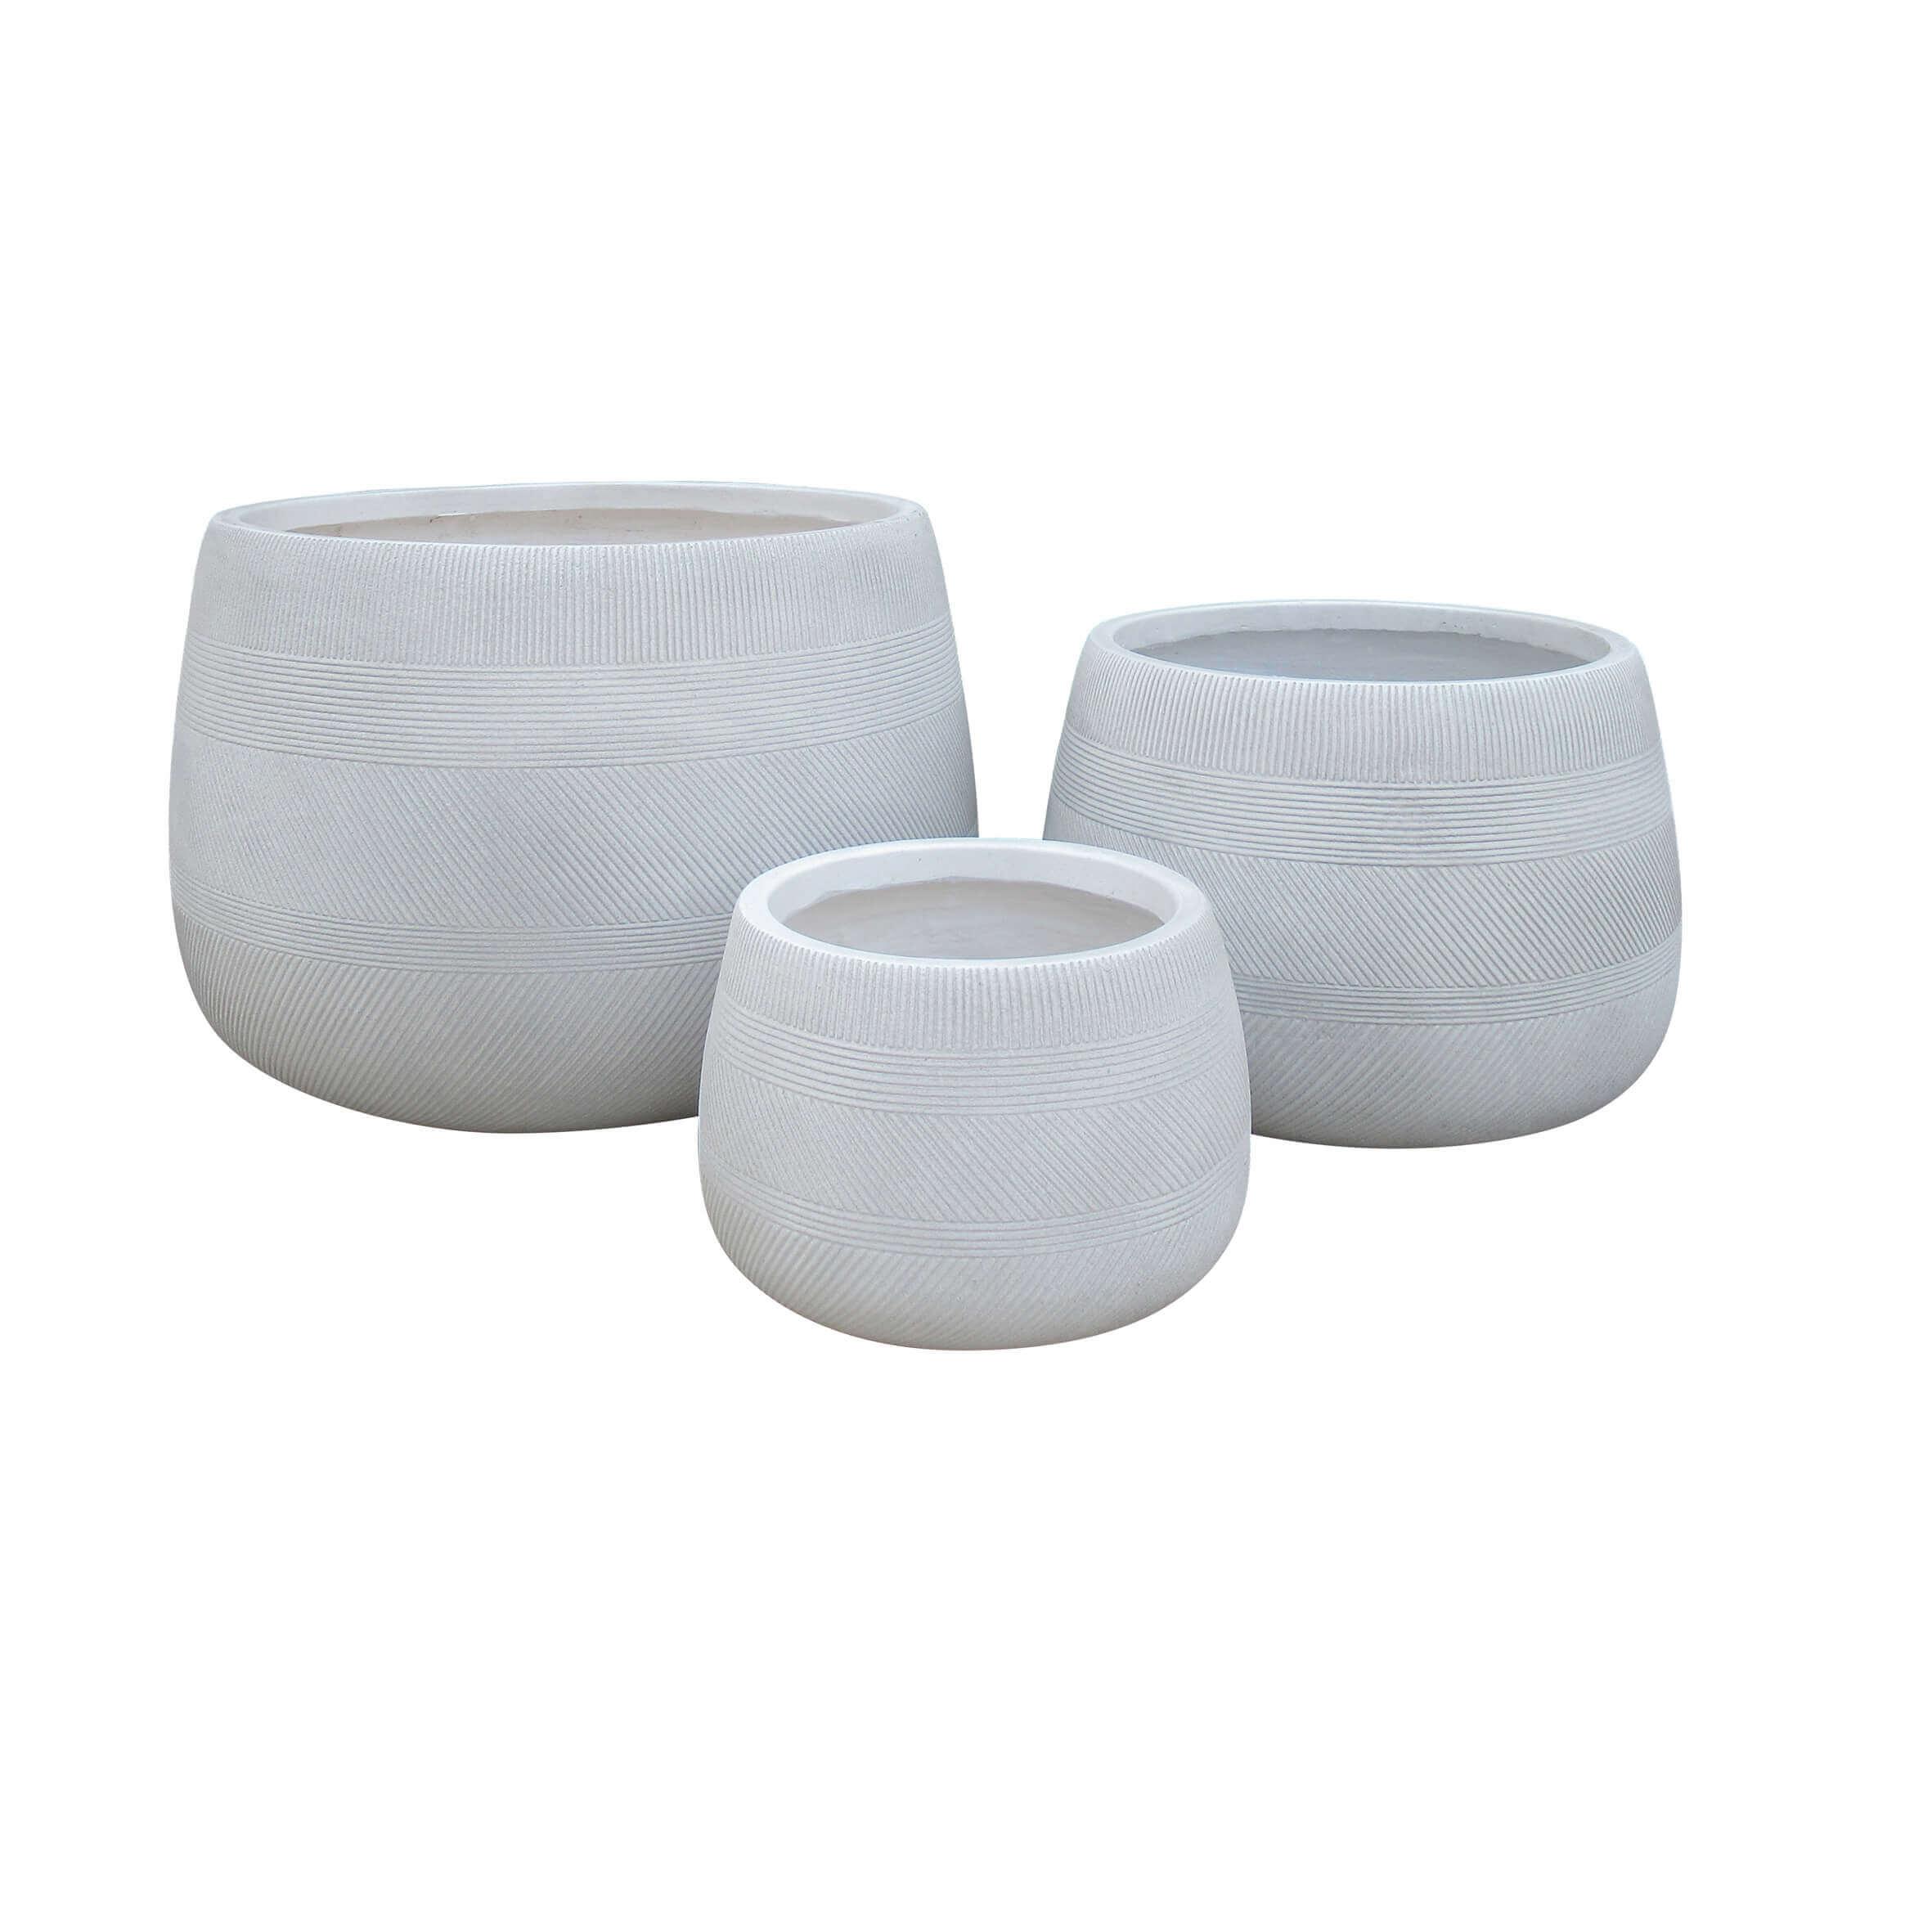 Milani Home ALVARO - set di 3 vasi